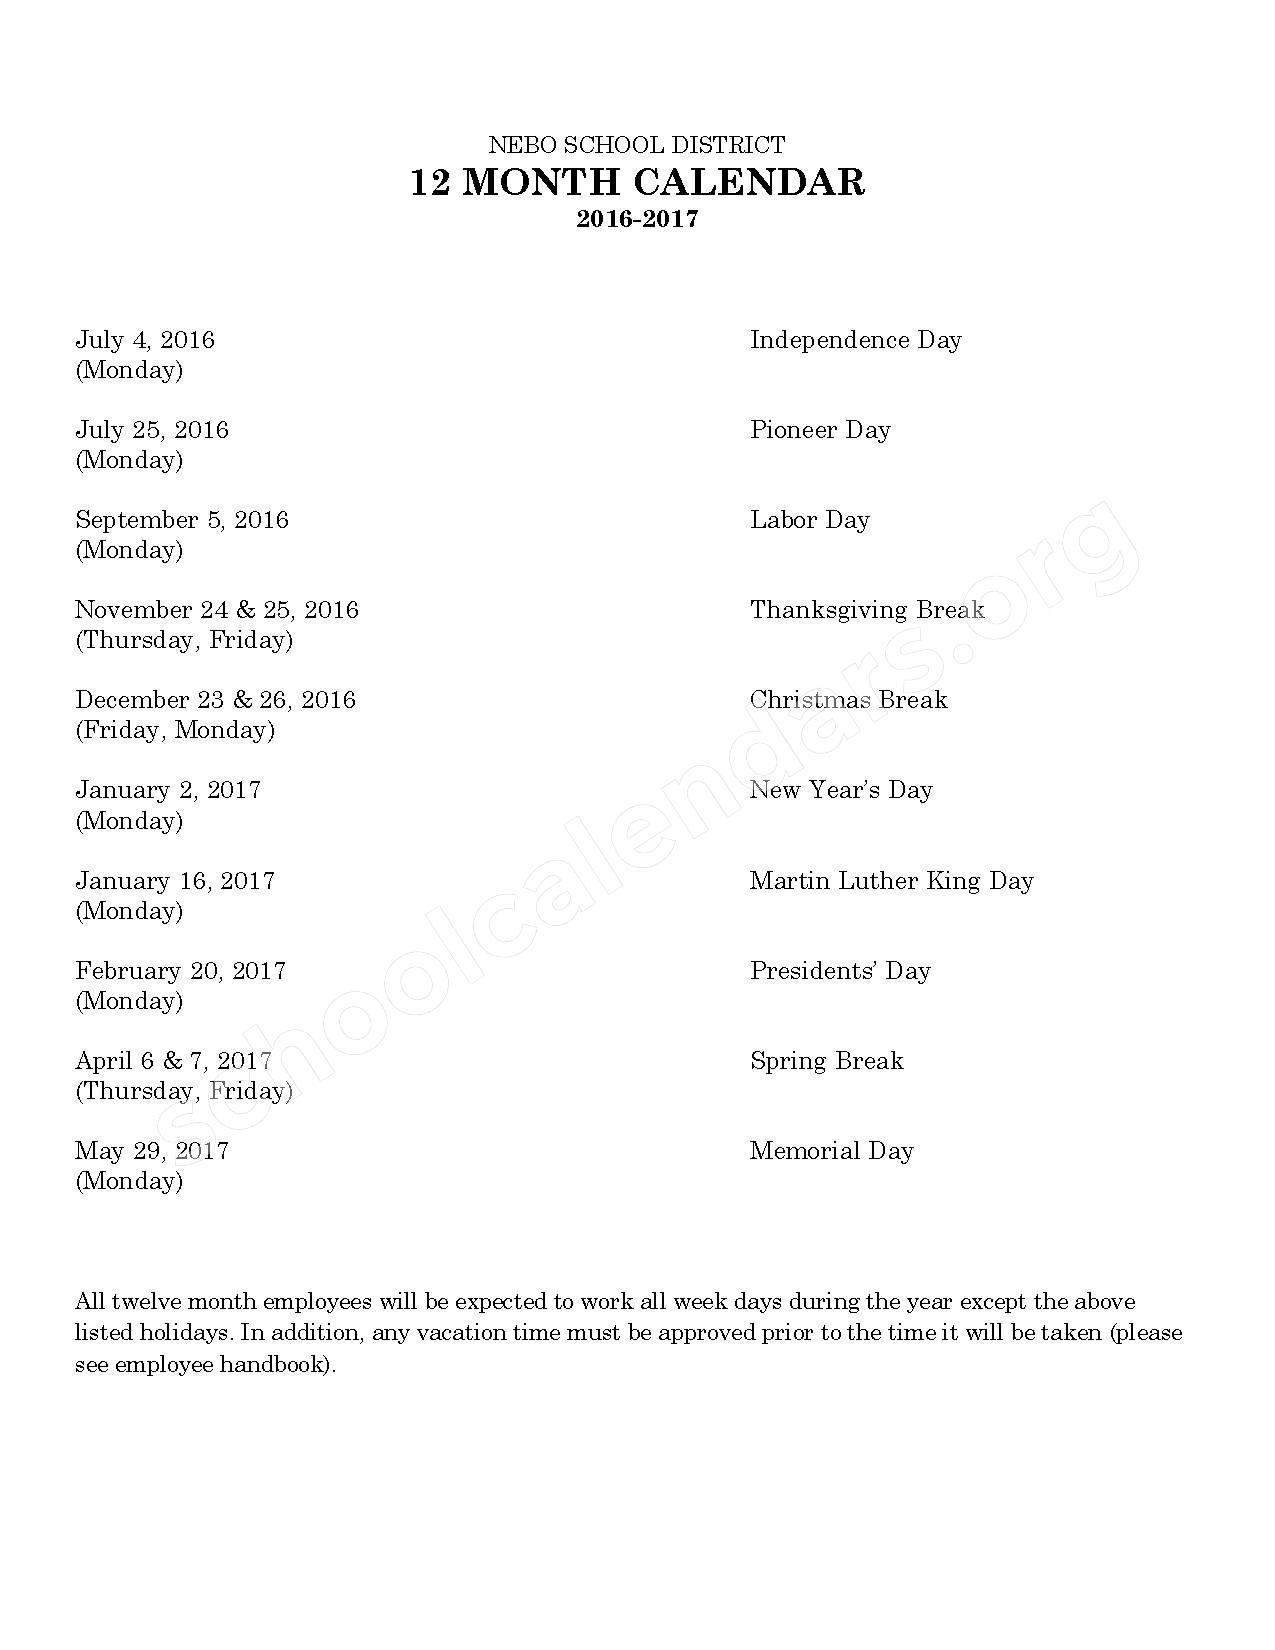 2016 - 2017 School Calendar – Nebo School District – page 2